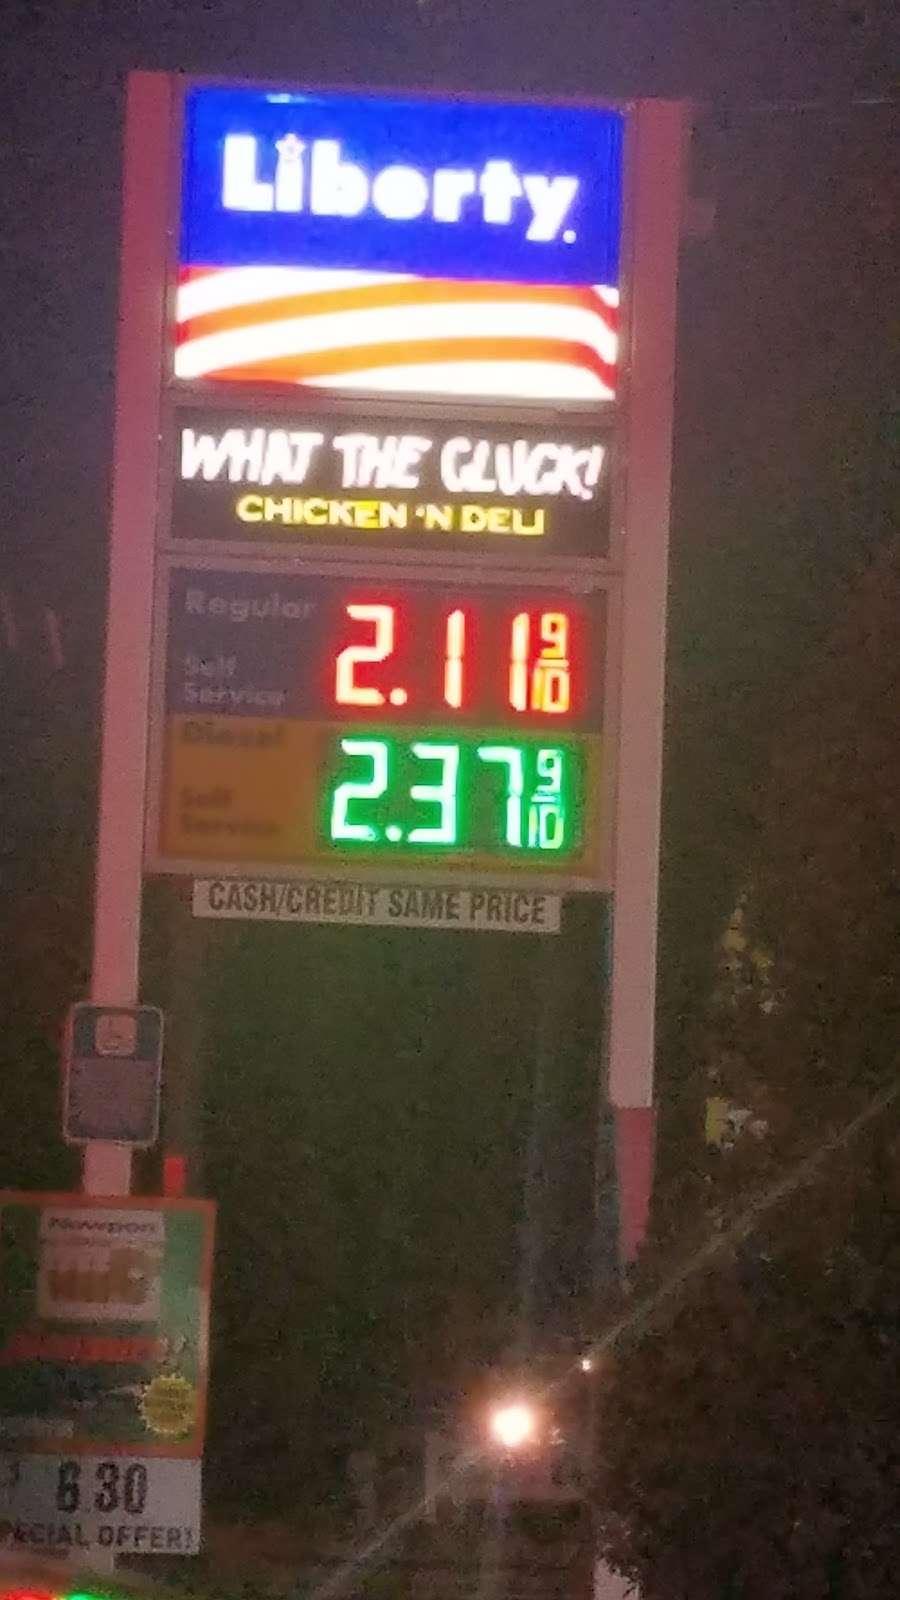 Liberty Happy Gas, Convenience Store & Deli - gas station  | Photo 7 of 7 | Address: 50 Birdie Ln, Magnolia, DE 19962, USA | Phone: (302) 535-8441